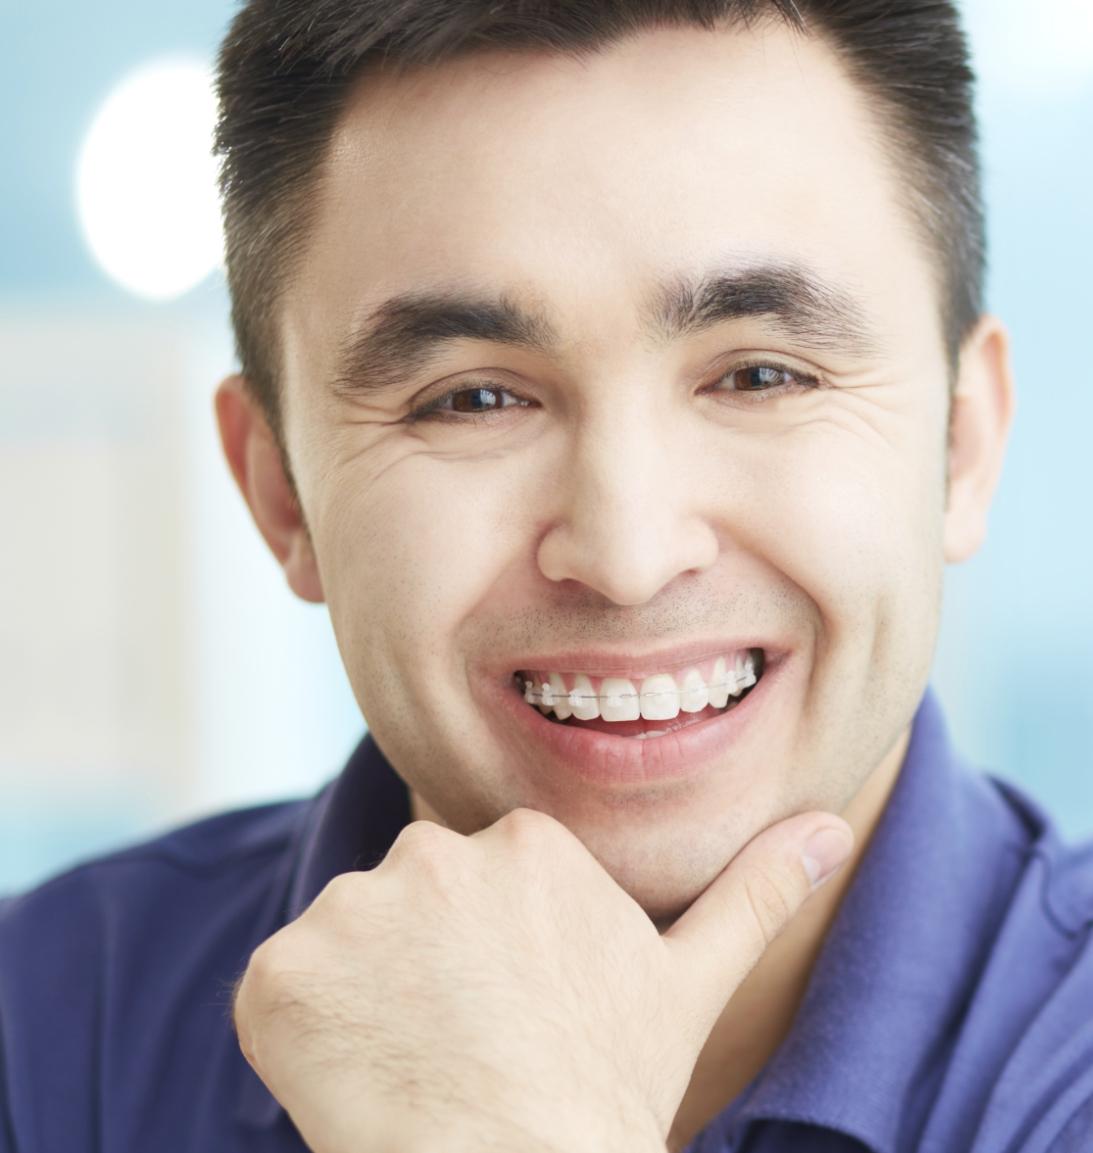 Orthodontic Treatment For Adults - Kawa Orthodontics - Braces Boca Raton - Orthodontics Kawa Orthodontics - Florida - Orthodontist Boca Raton - Invisalign boca raton